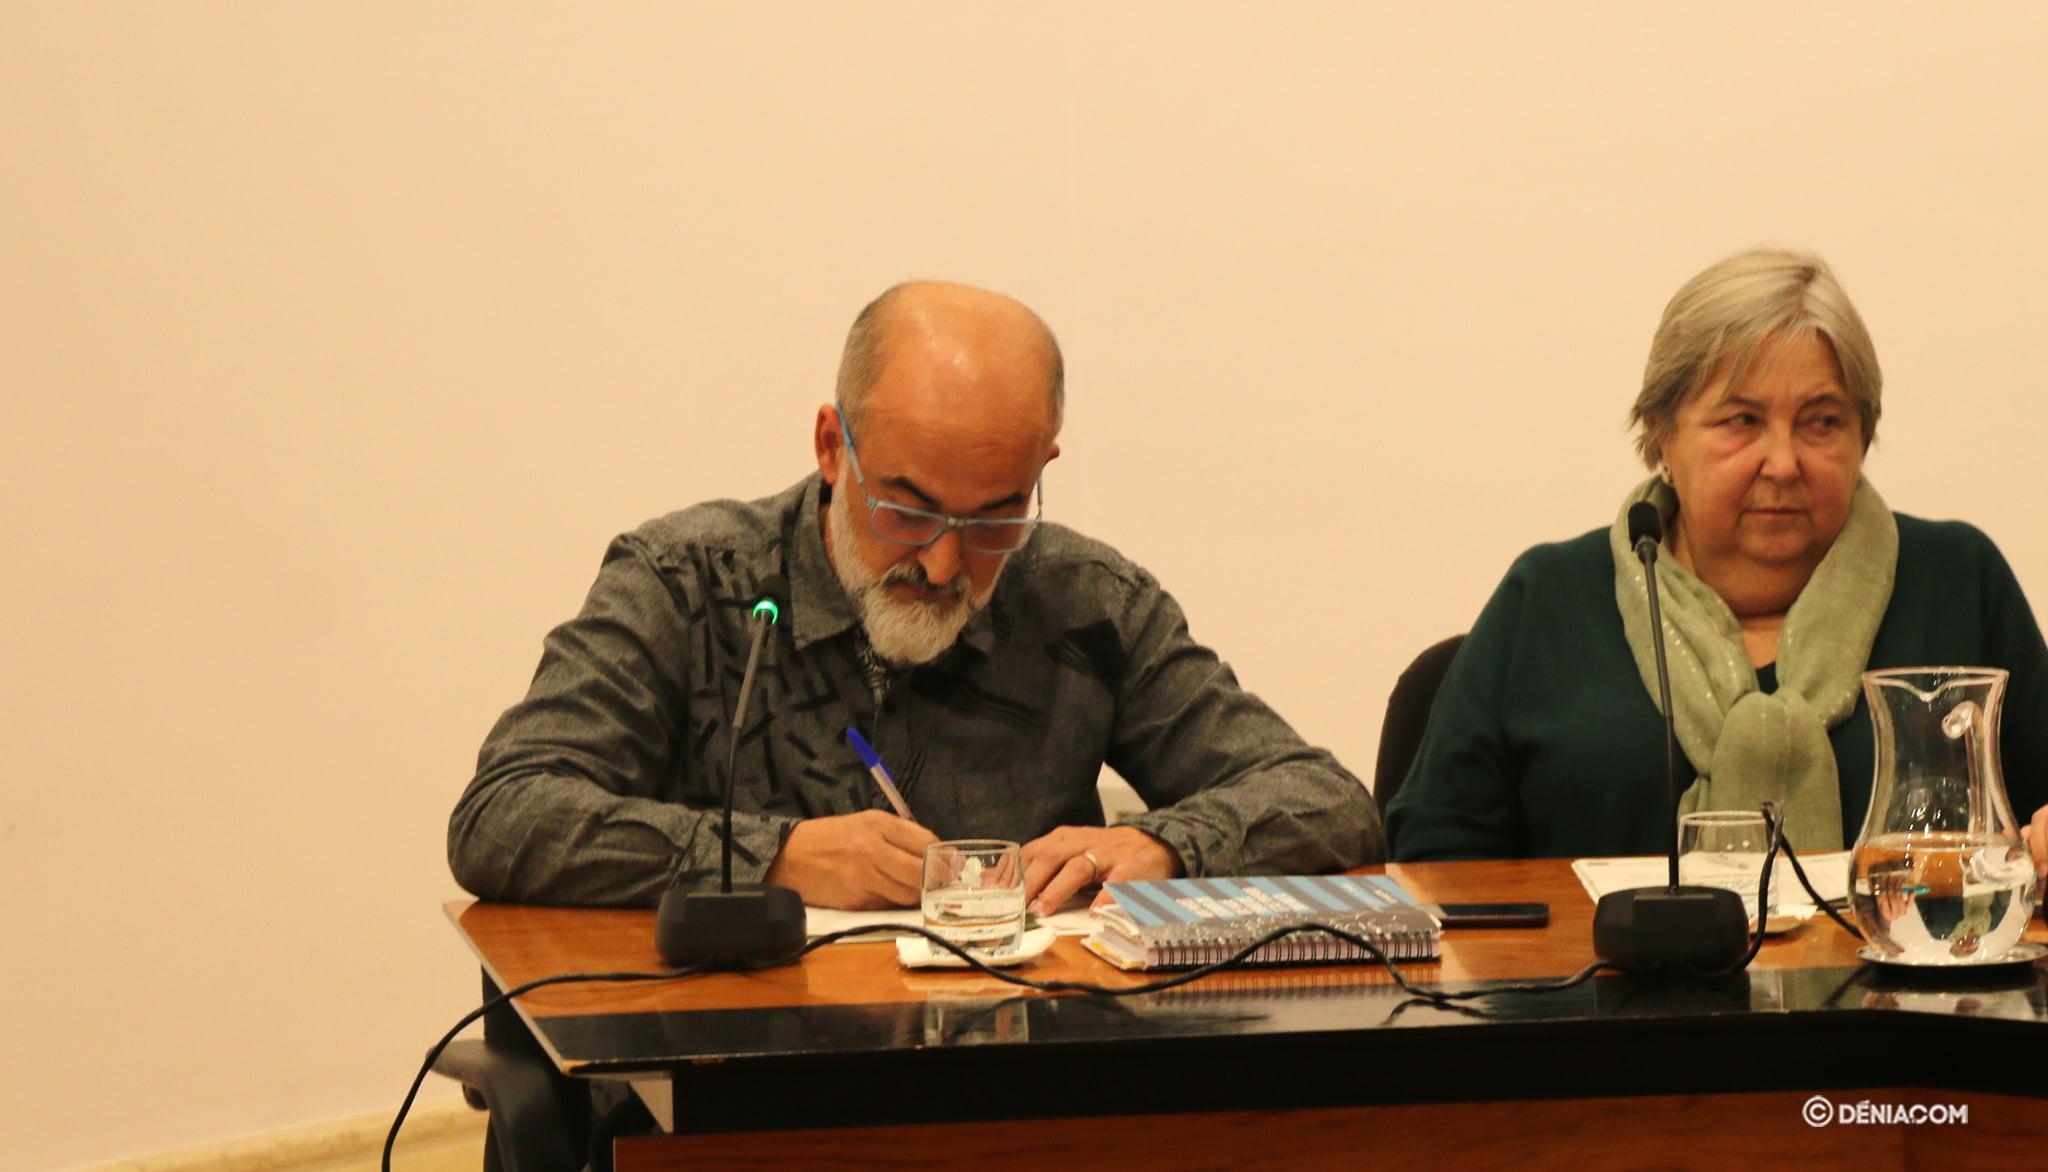 Javier Scotto, regidor de l'PSPV